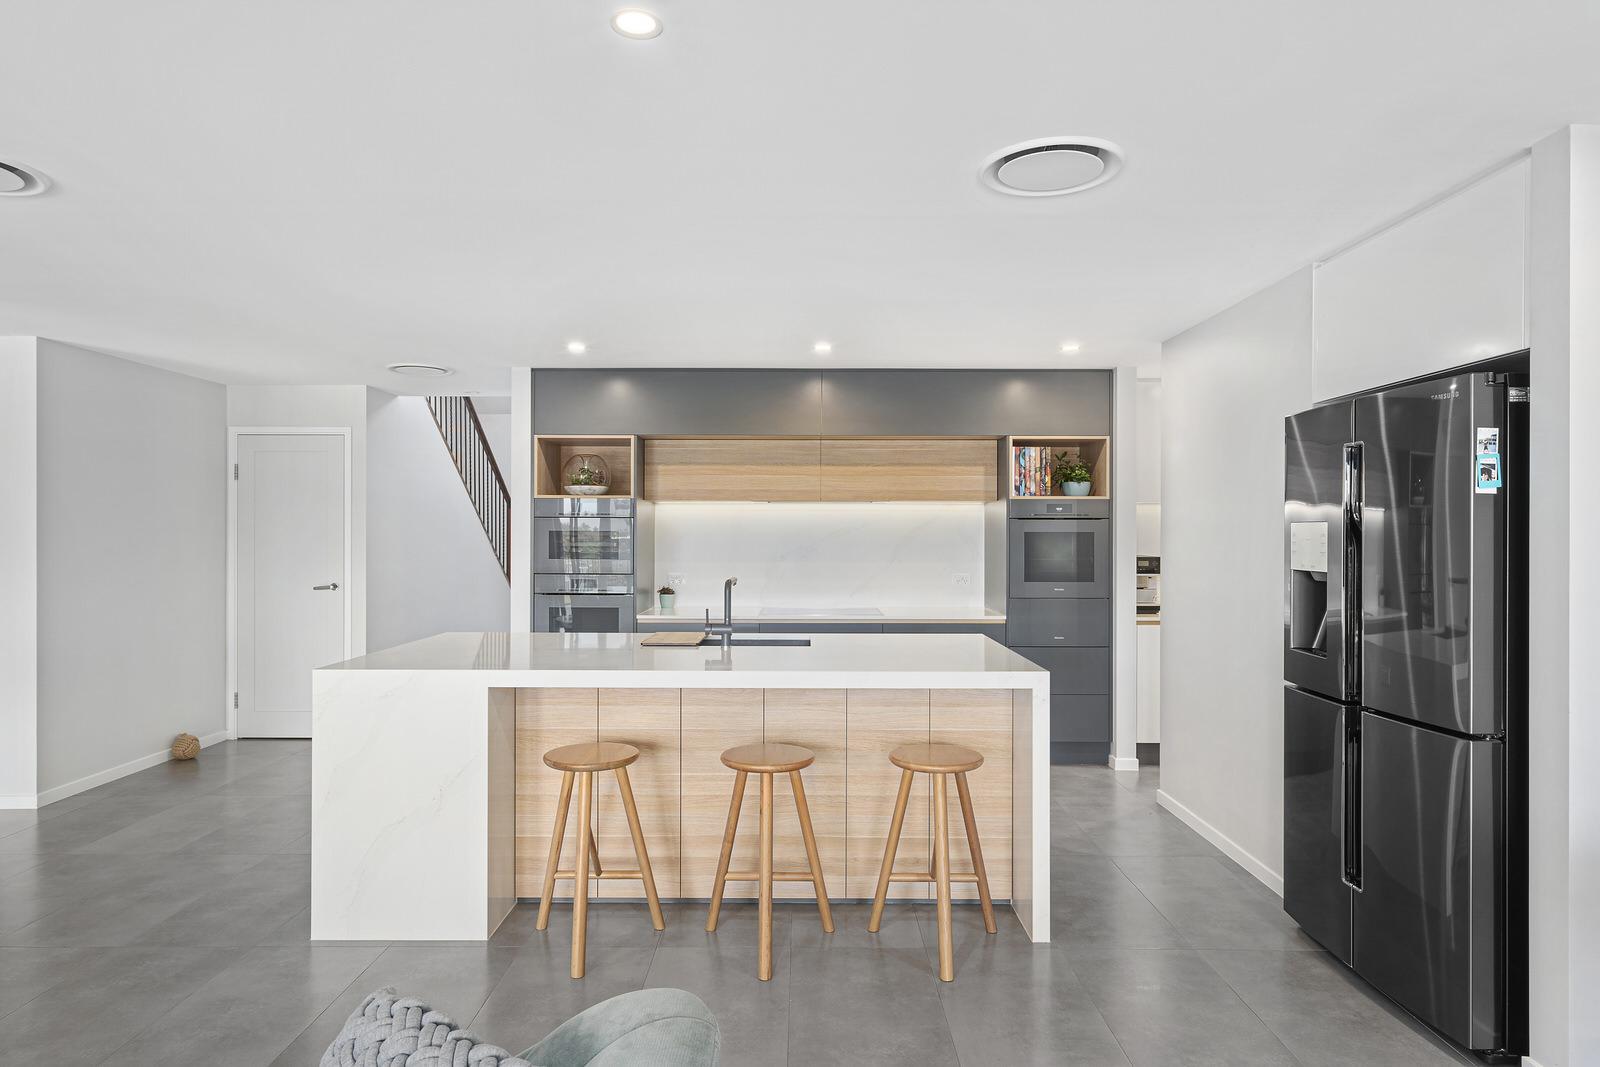 breakfast bar in kitchen renovation